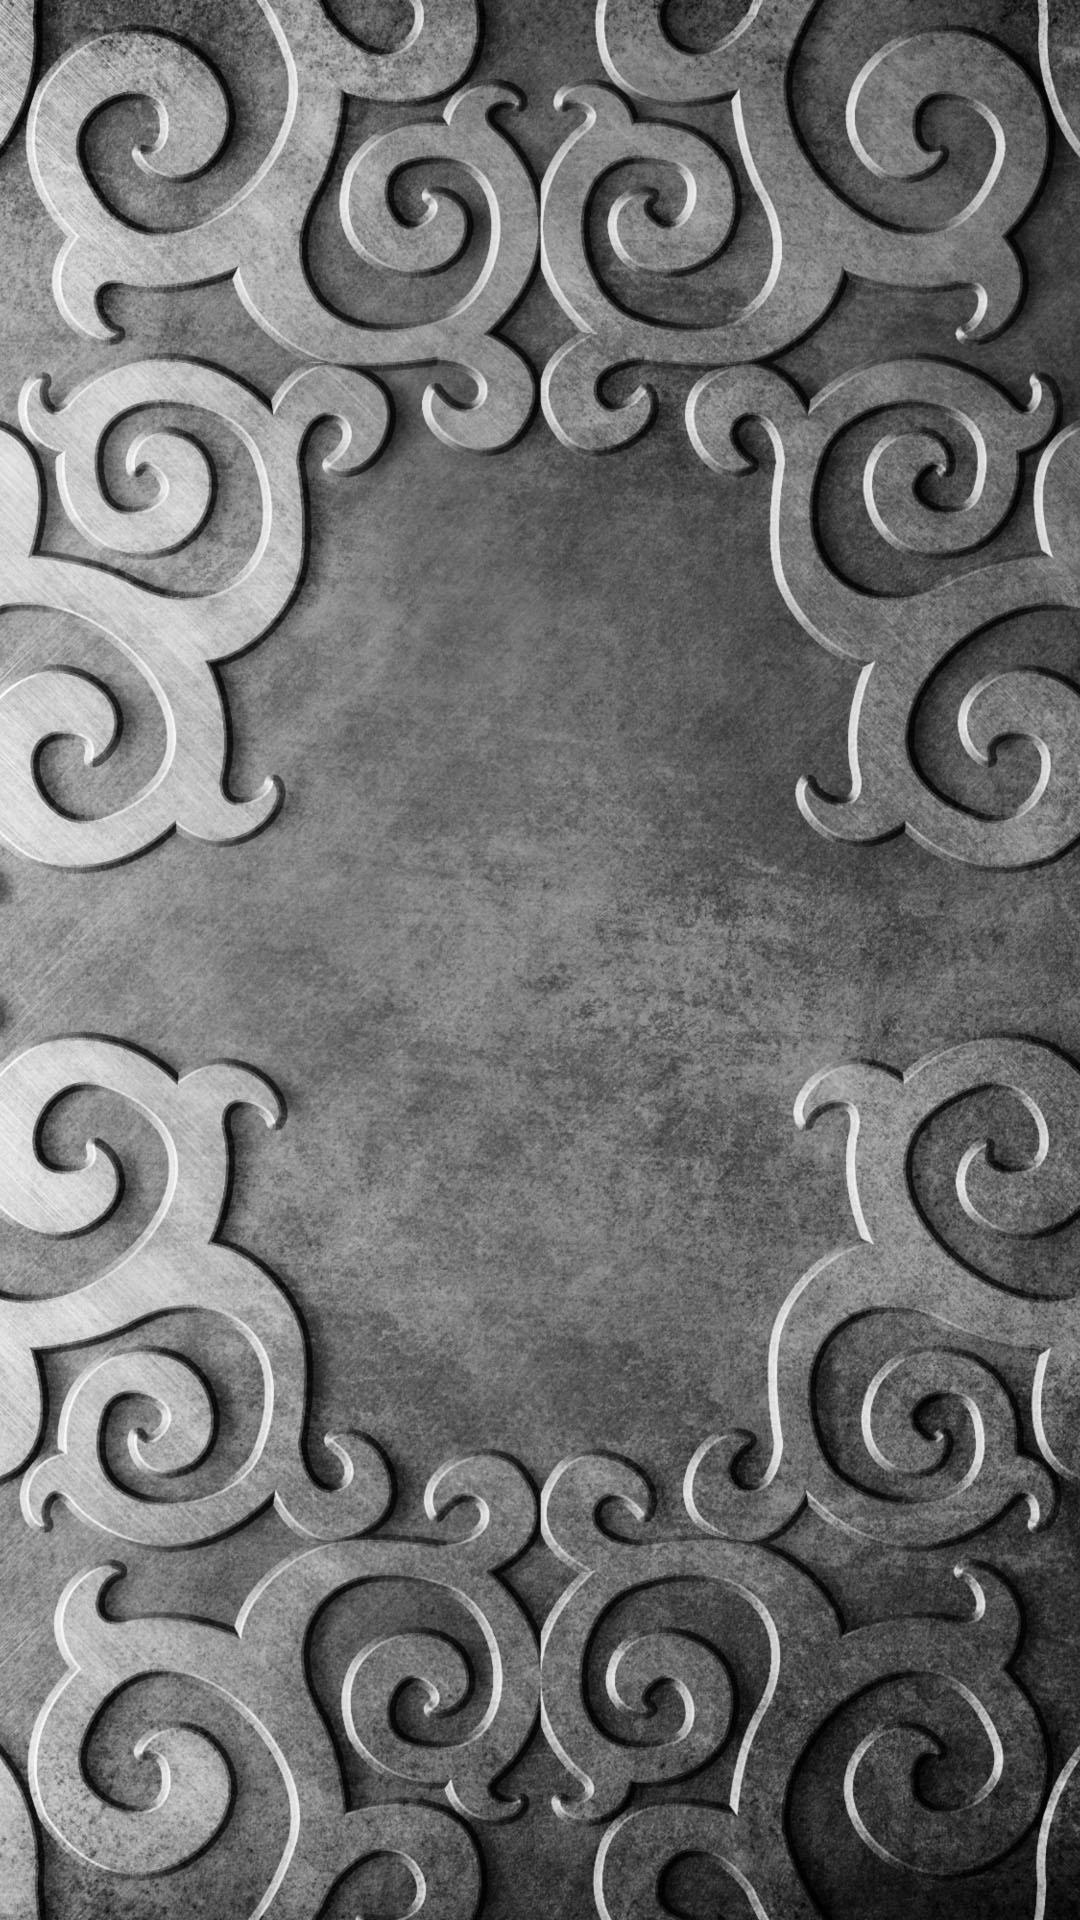 Серебряный орнамент орнамент металл